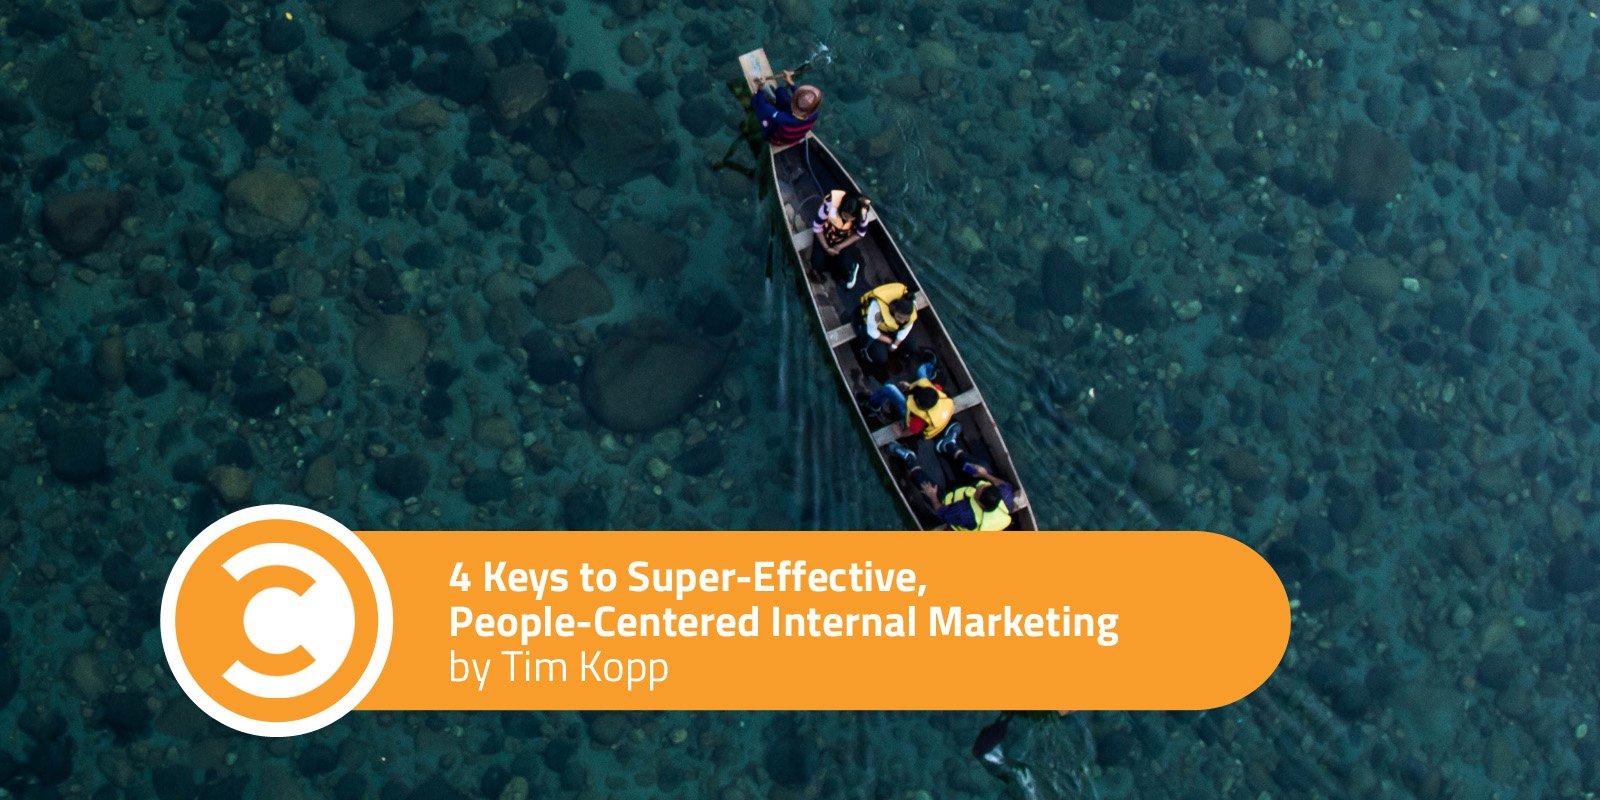 4 Keys to Super-Effective, People-Centered Internal Marketing